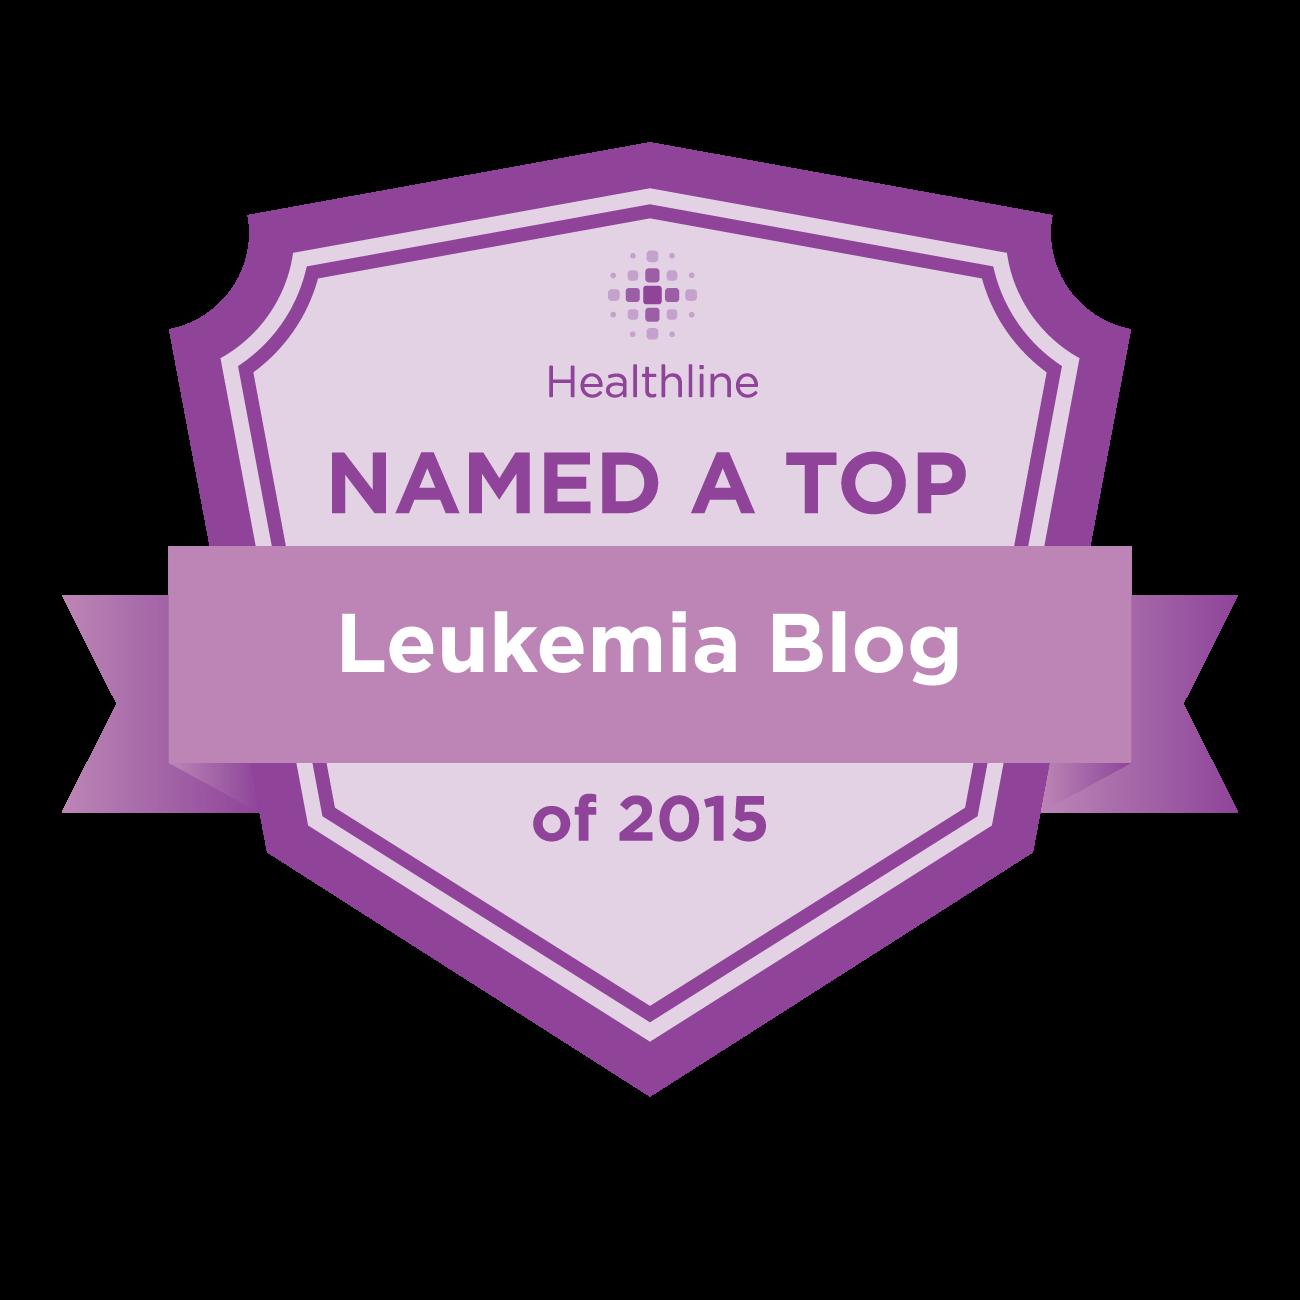 Healthline named this a top Leukemia Blog!